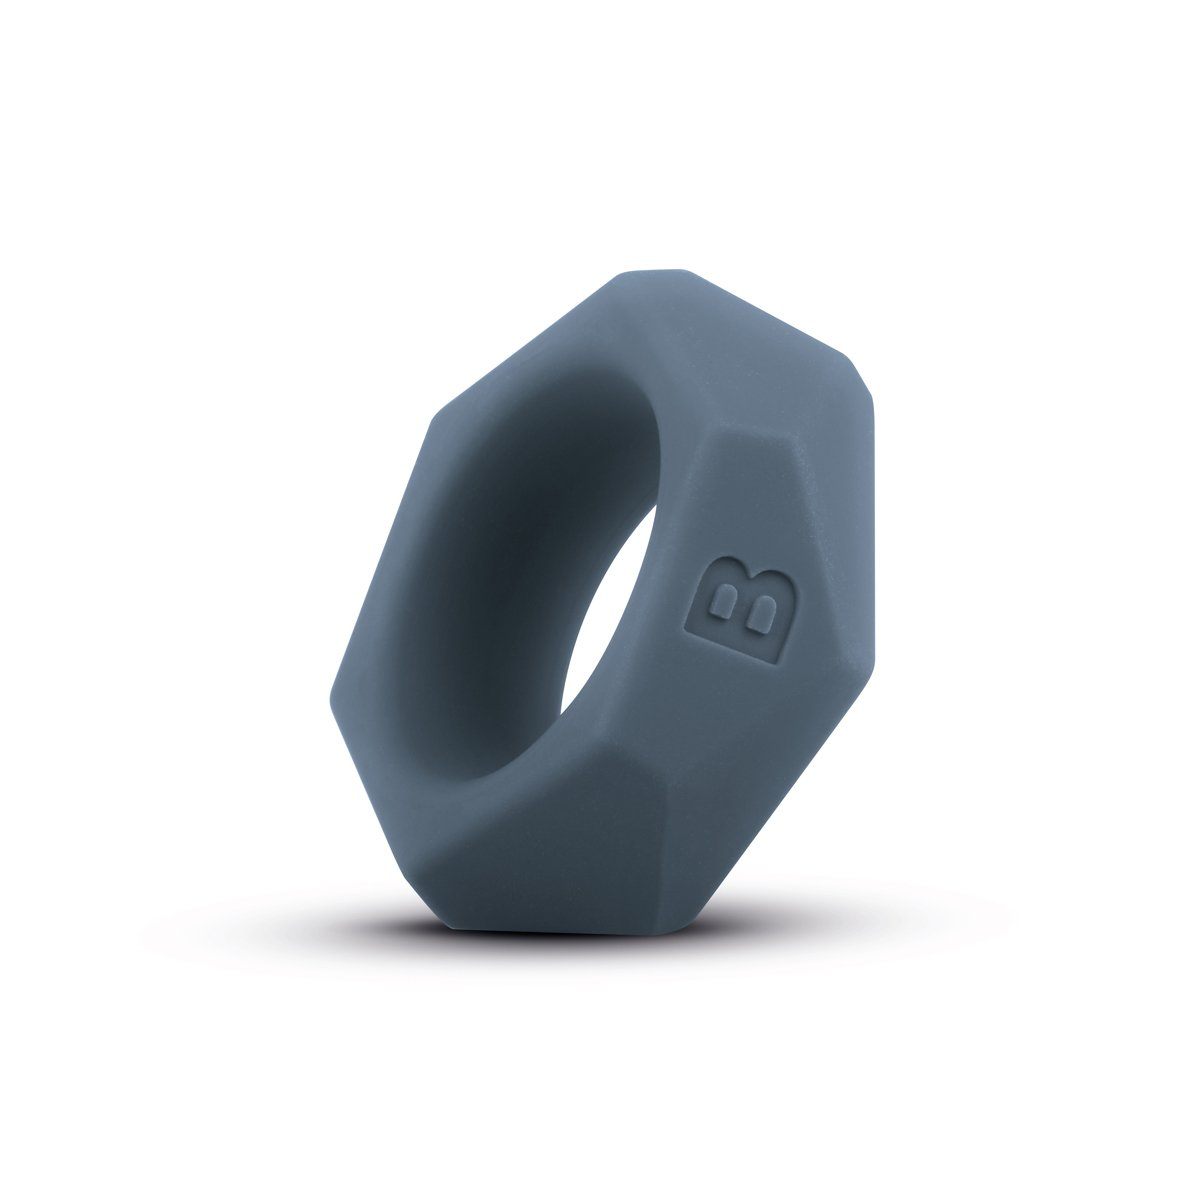 BONERS Diamond Cock Ring - Ø1,5inch - Dark Grey - 100% Silicone Penis Ring